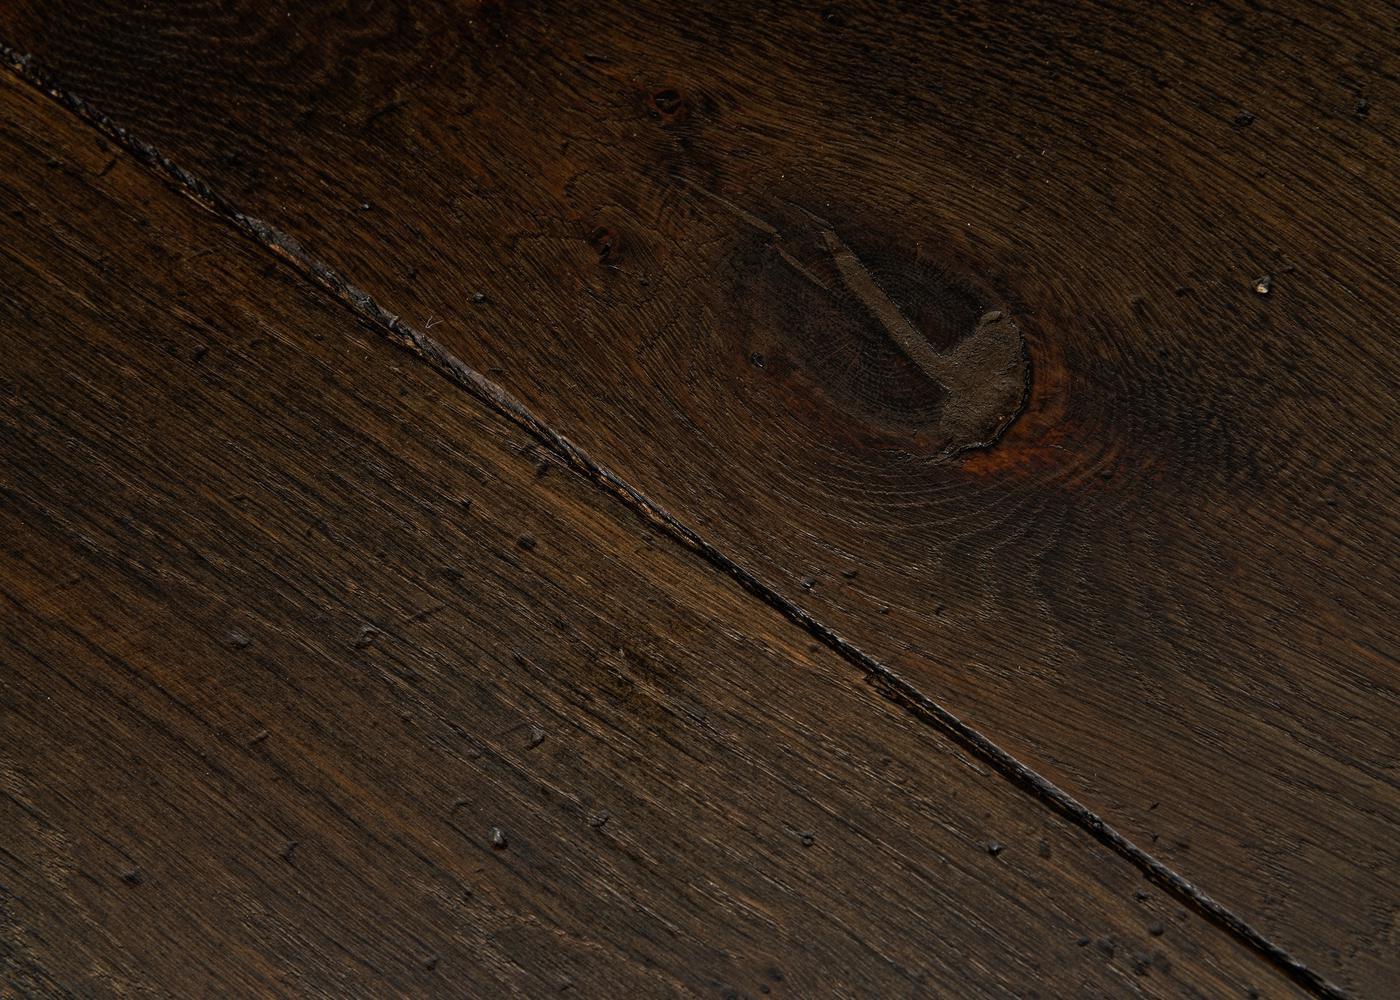 Parquet chêne massif BALTHAZAR Elégance vieilli huile cire 14x110x500-2000